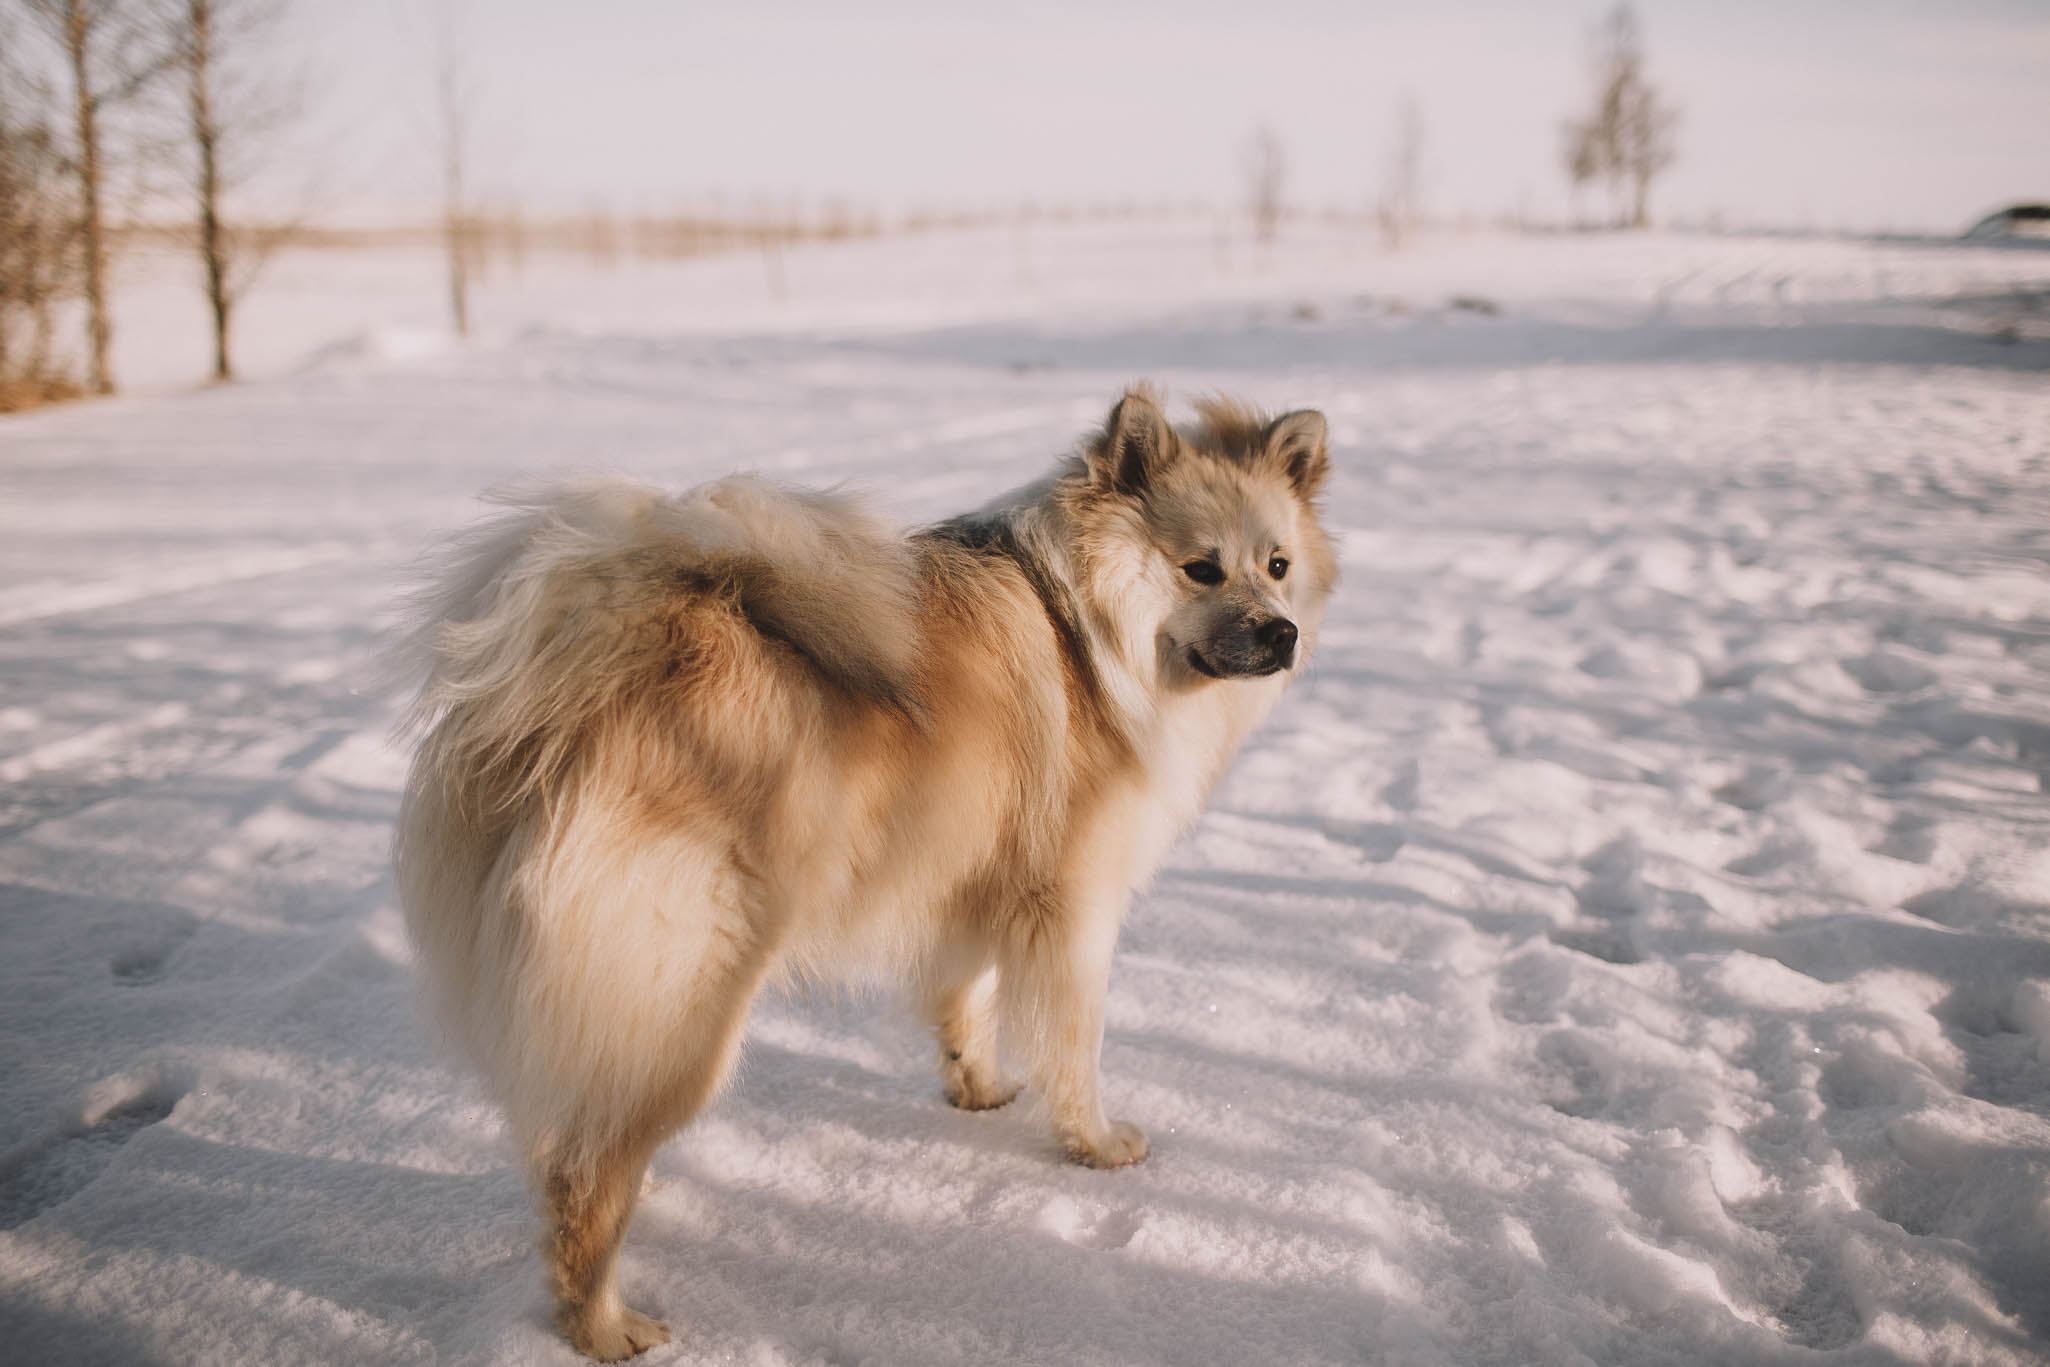 Road-trip-Islande-Iceland-Voyage-Travel-Portrait-Jérémy-Boyer-Sunny-day-dog-snow-11.jpg